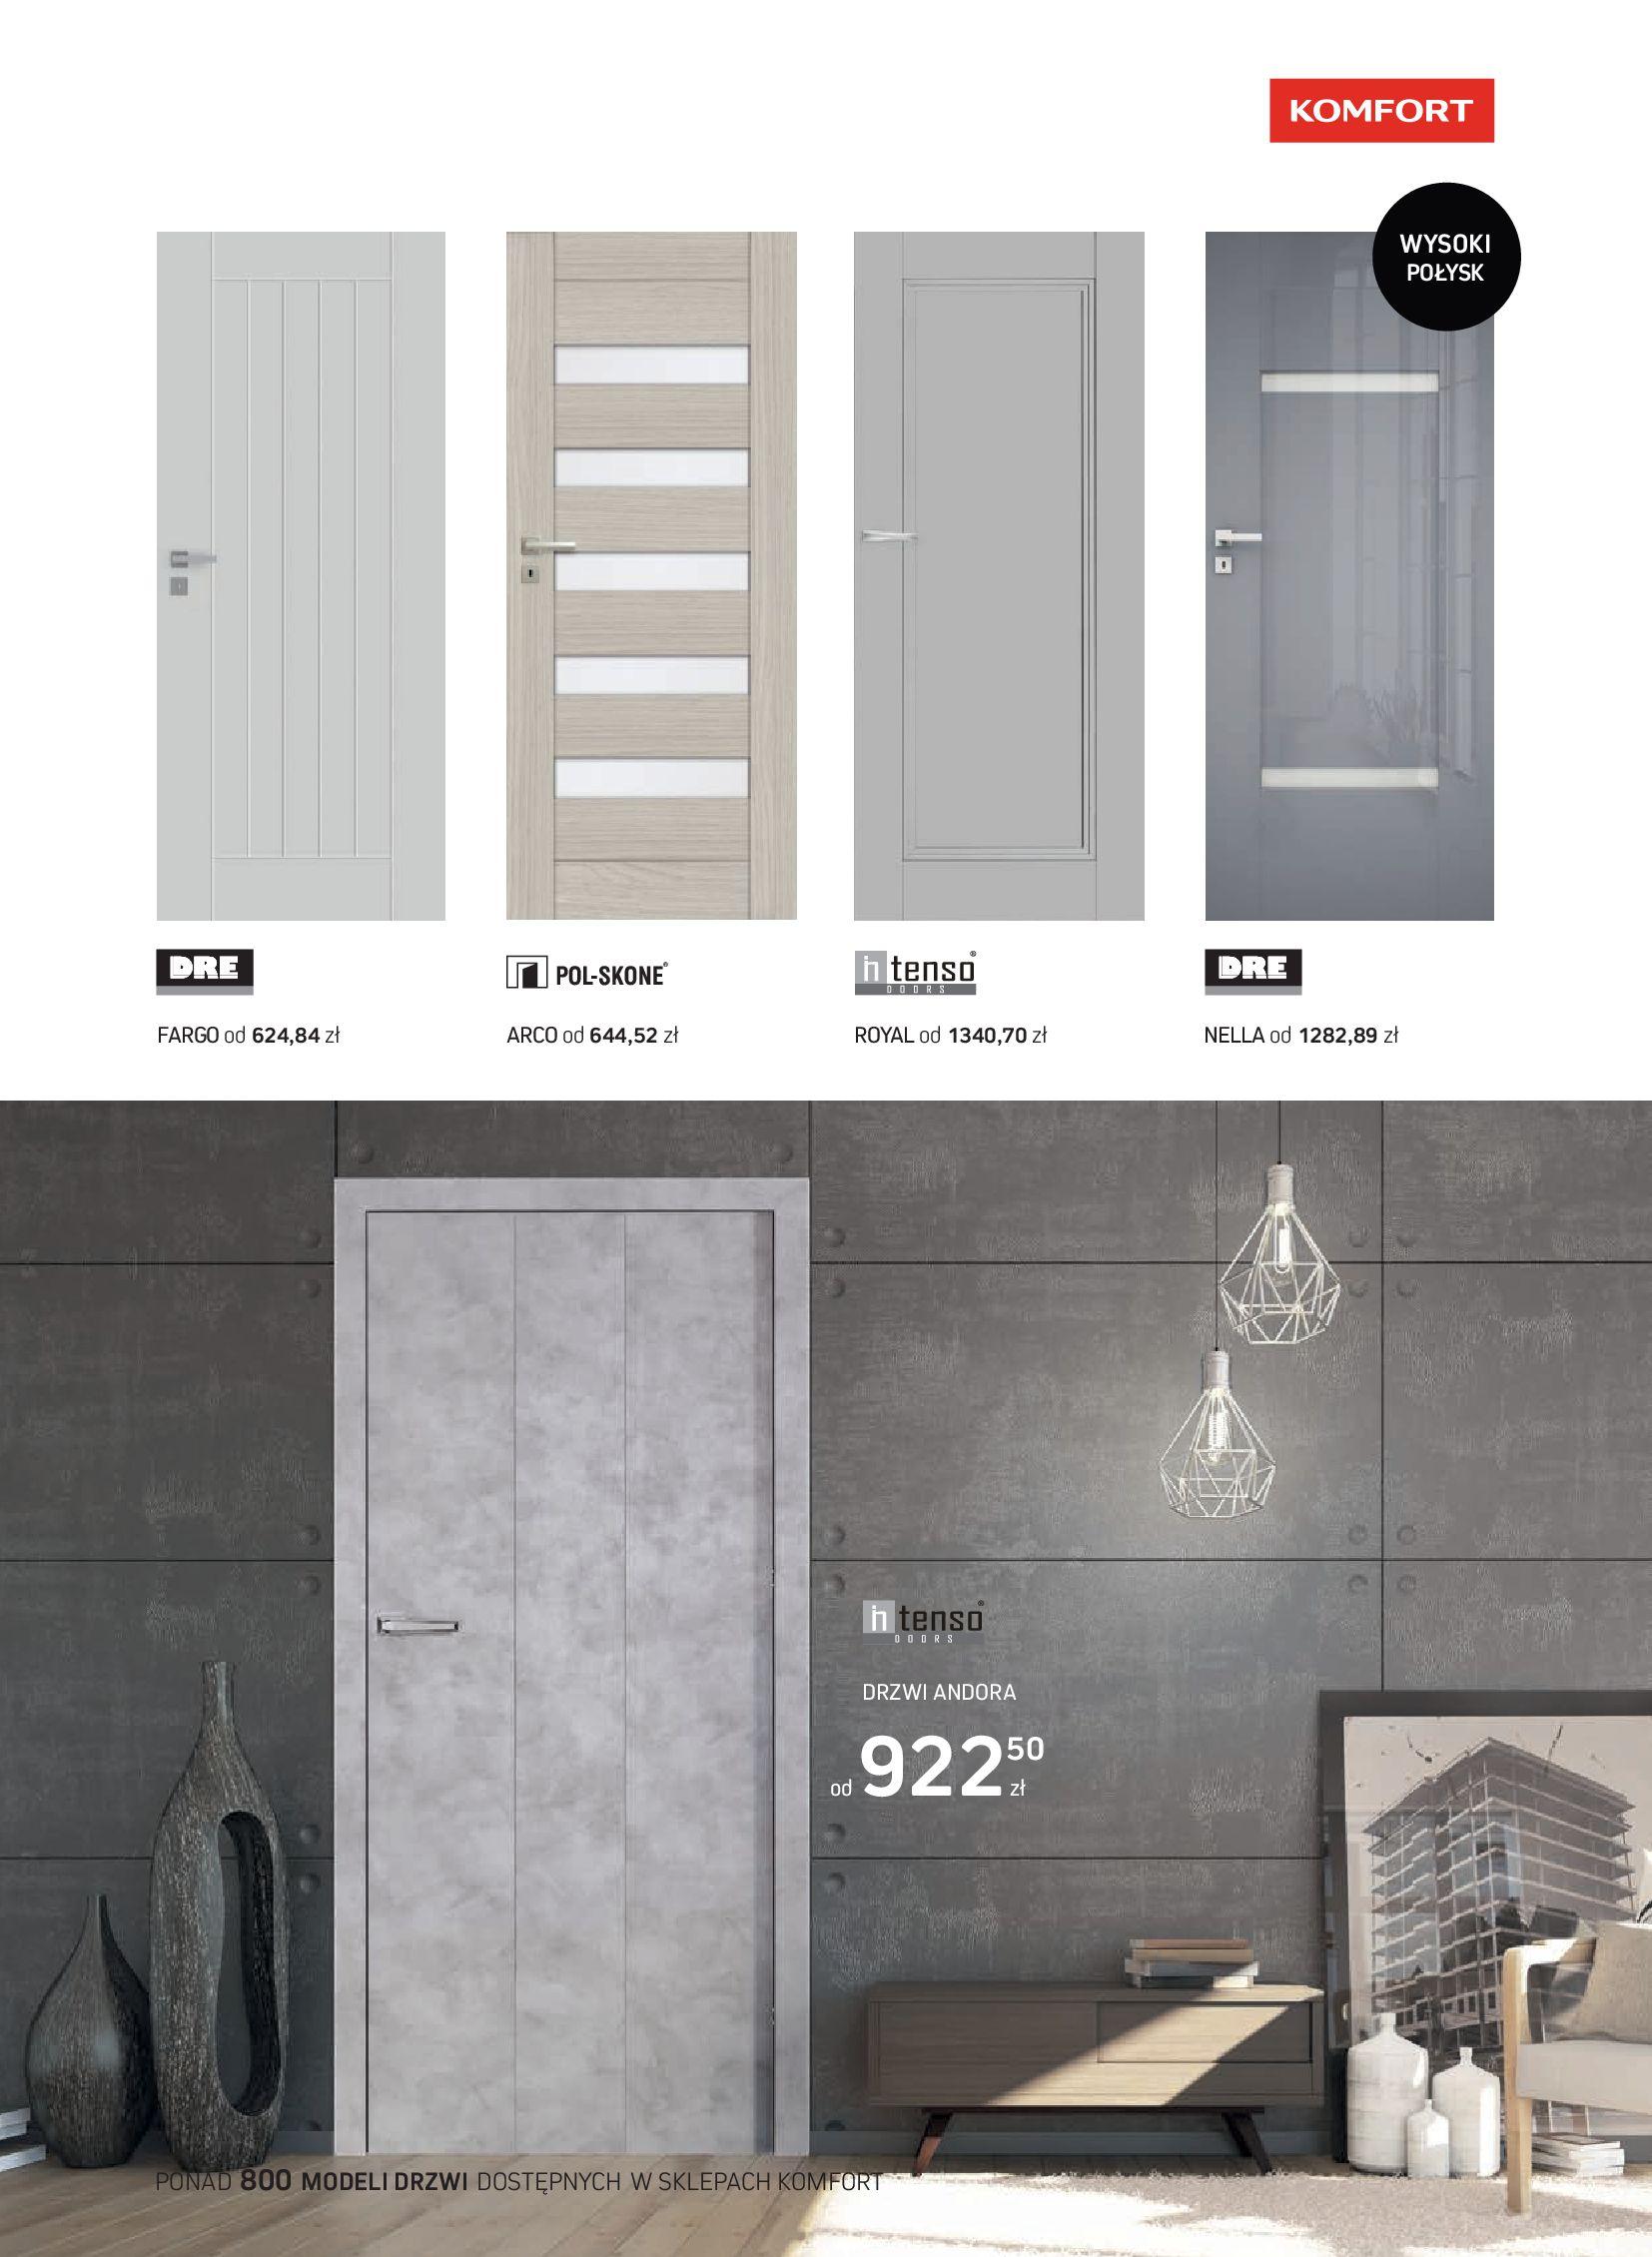 Gazetka Komfort: Gazetka Komfort - Katalog podłogi i drzwi 2021-06-16 page-57